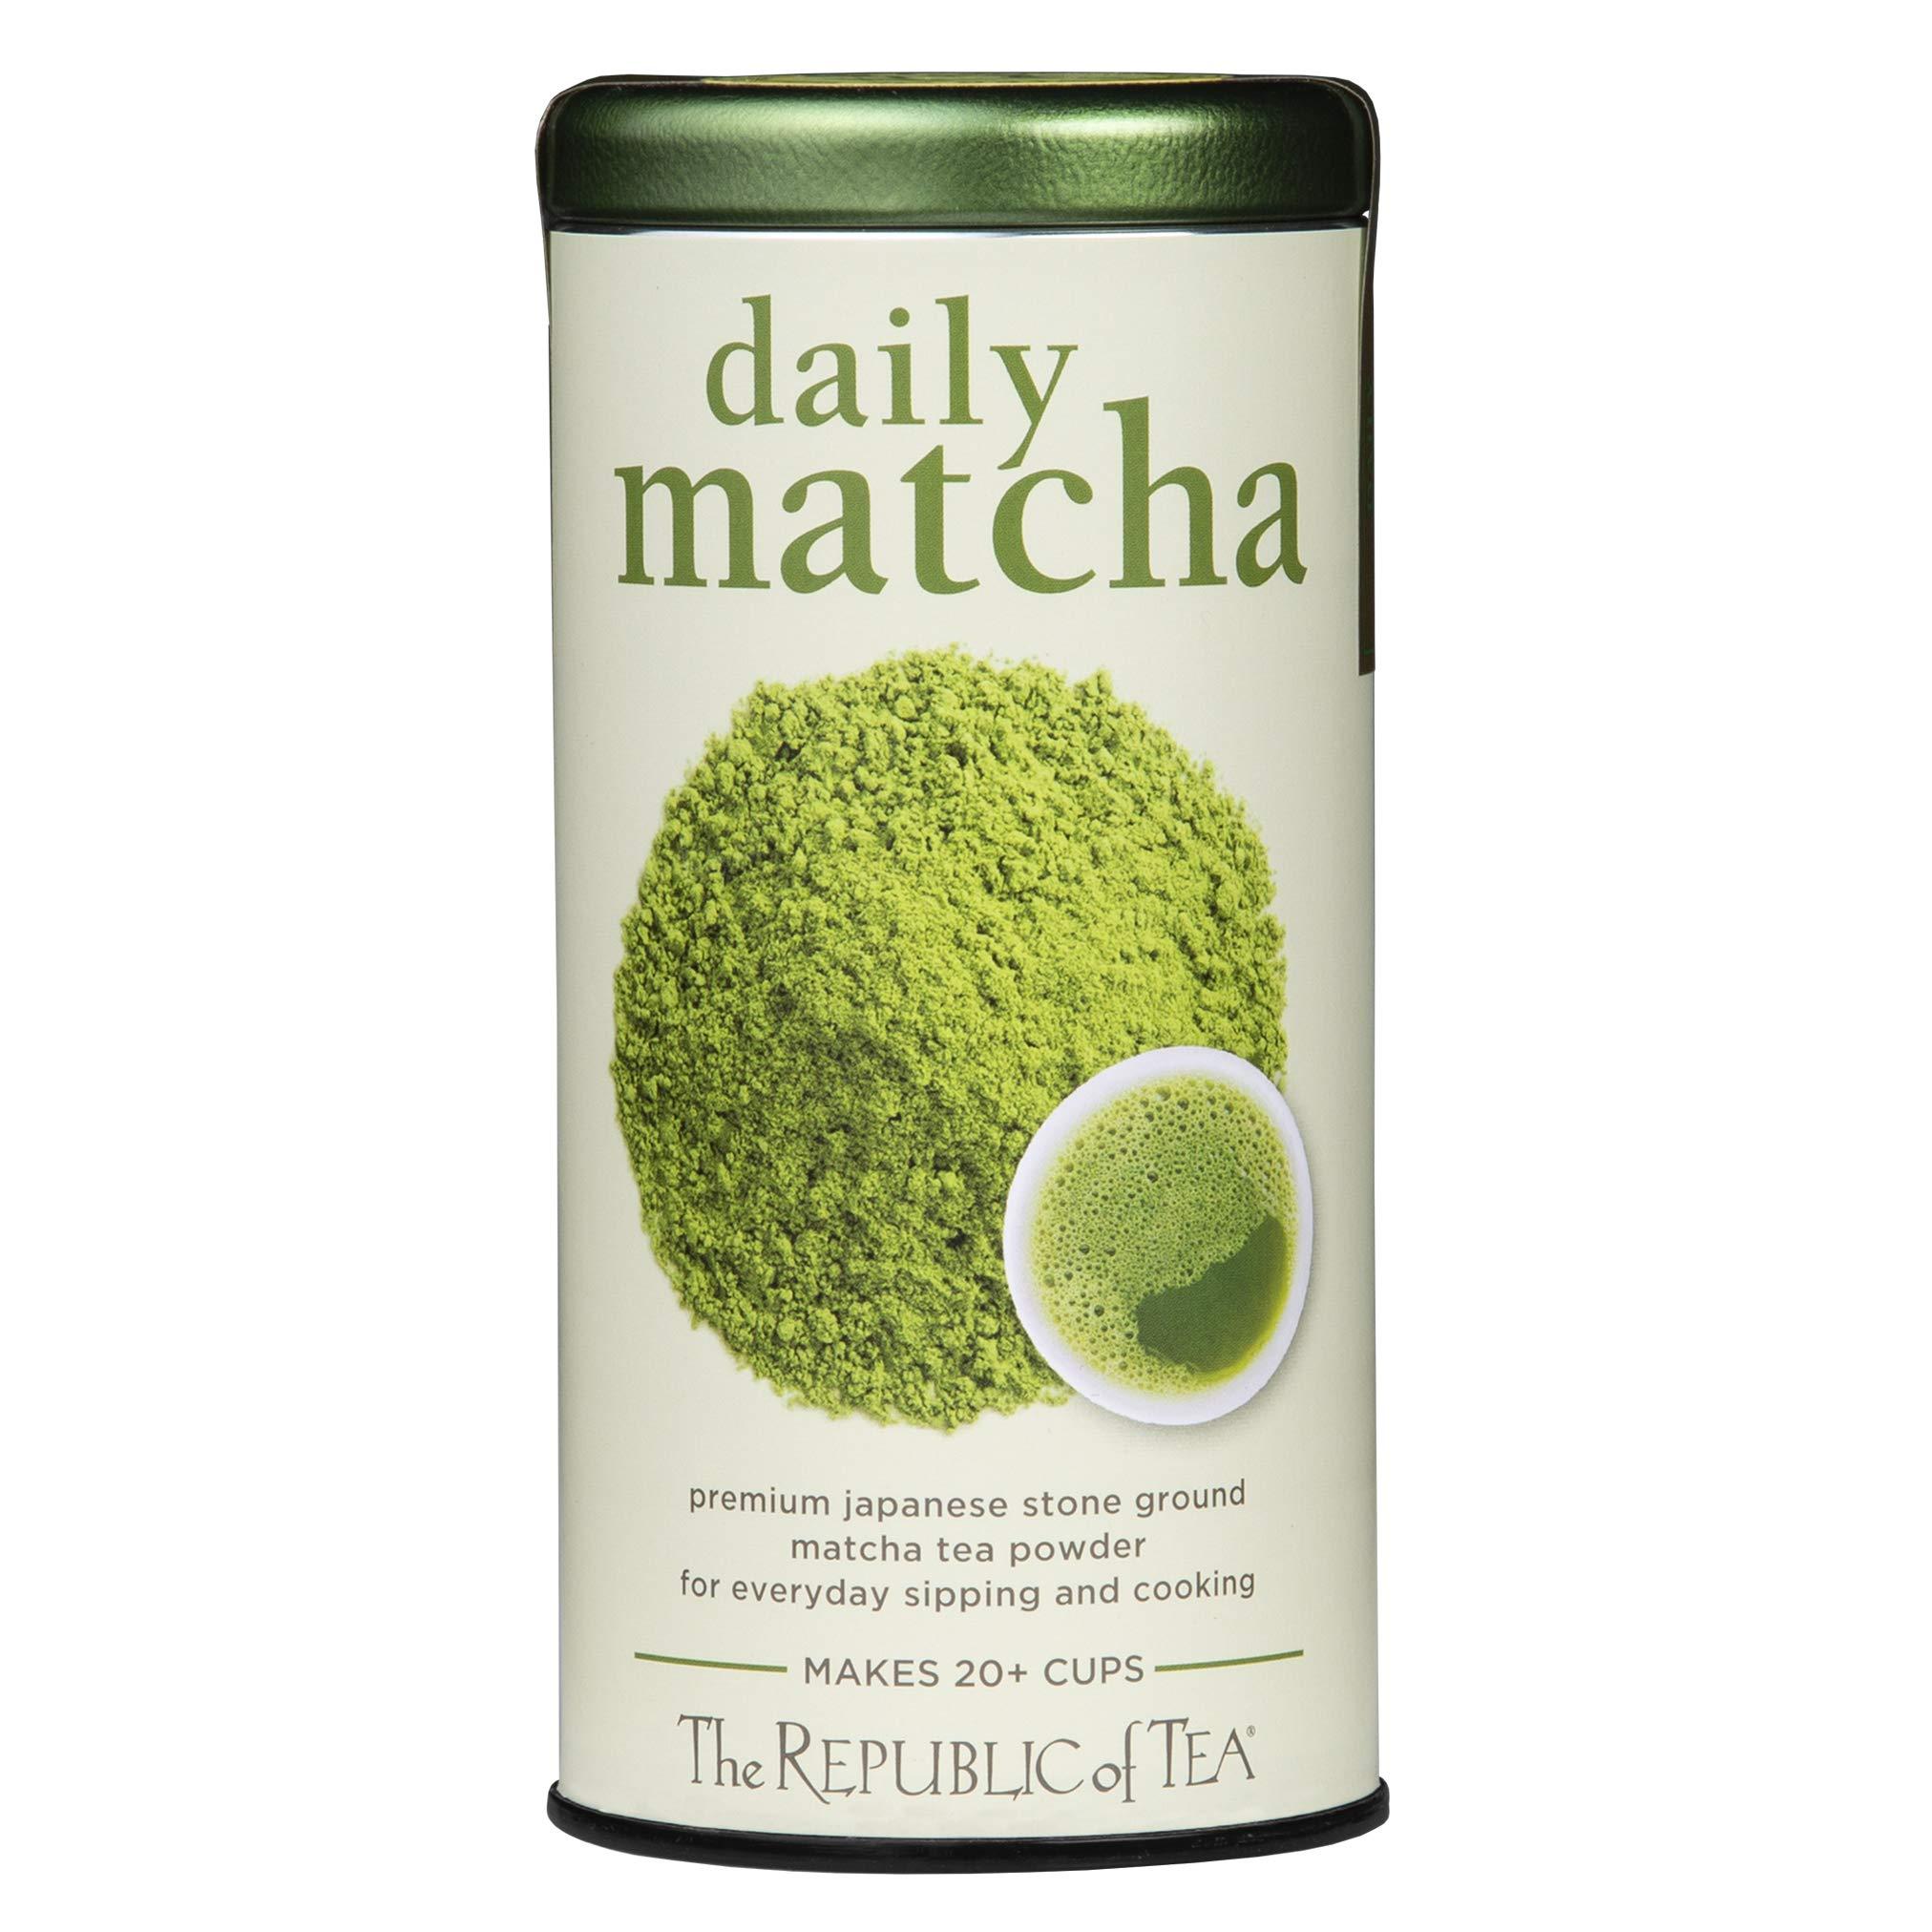 The Republic of Tea Japanese Daily Matcha Powder, Non-GMO Verified (1.5 Ounce Tin)